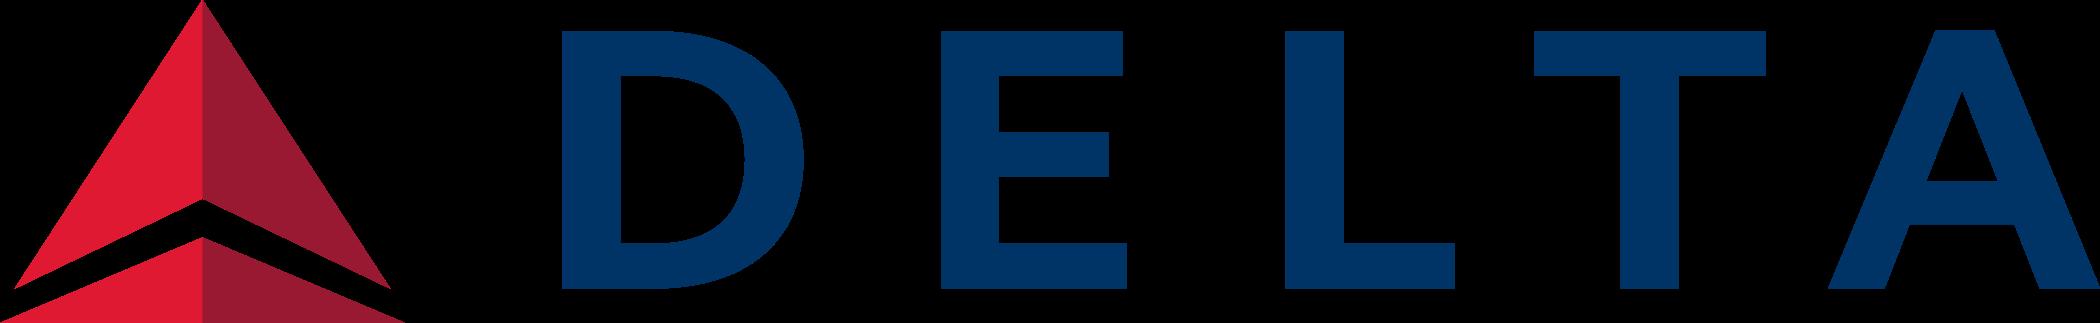 delta air lines logo 1 - Delta Air Lines Logo